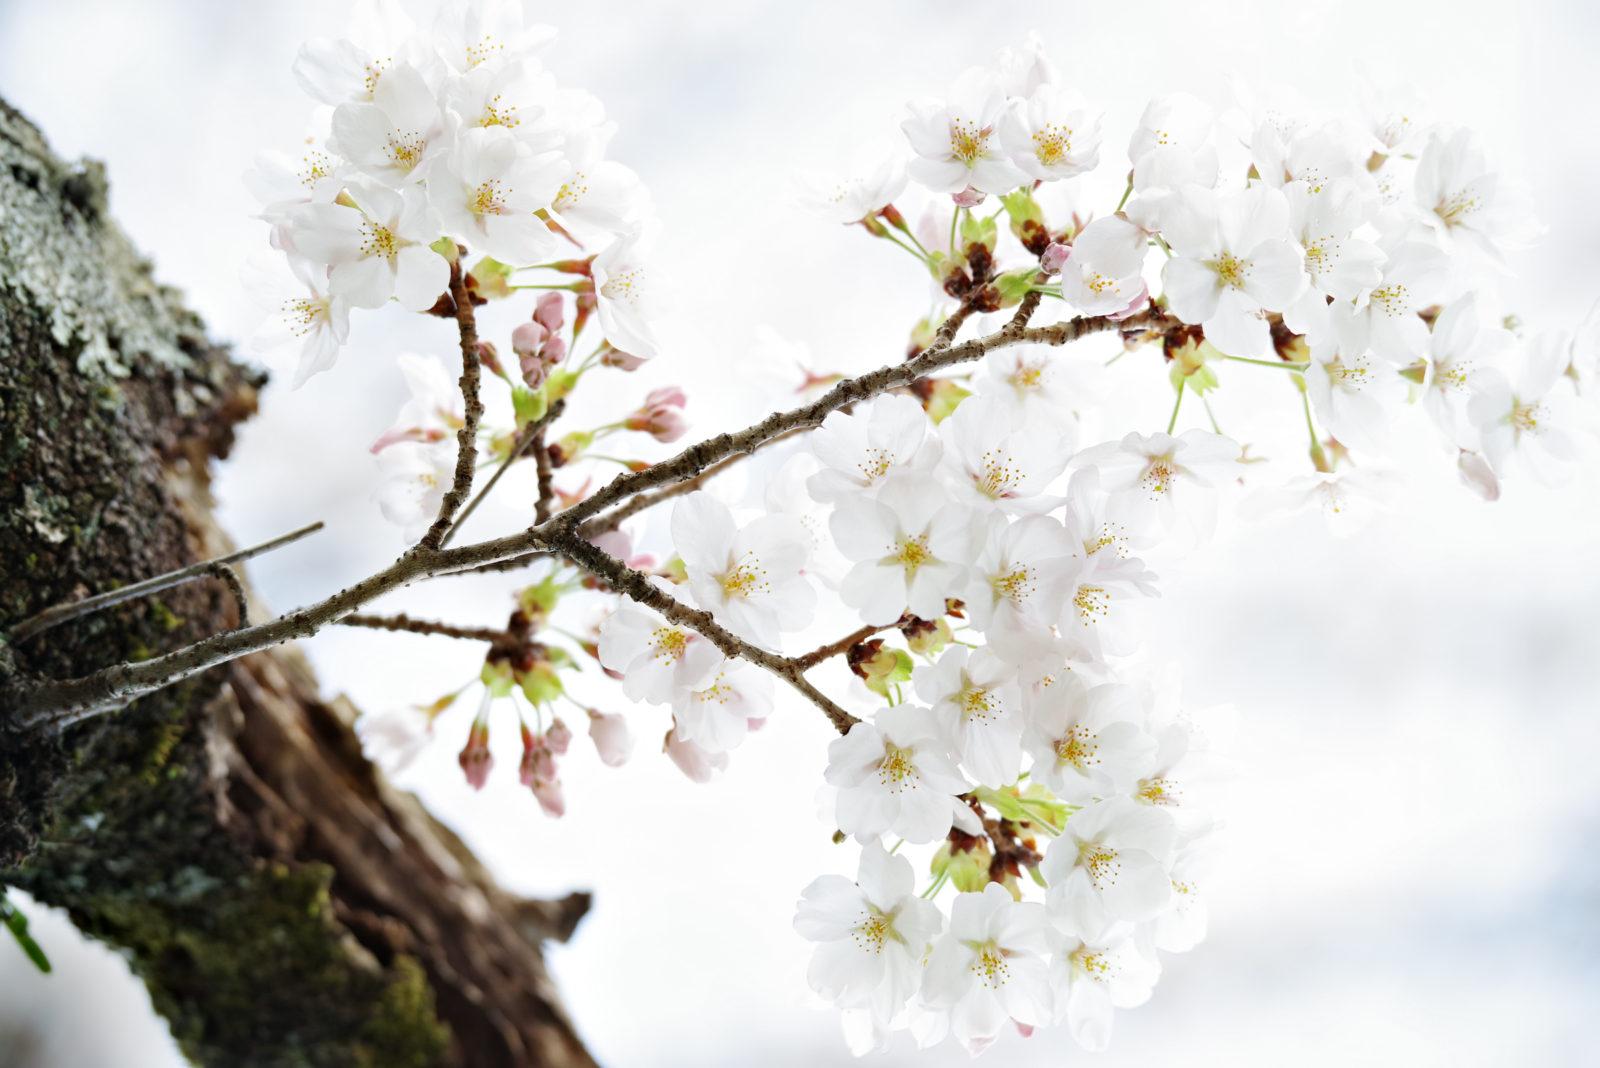 奥多摩湖の桜 | PENTAX K-1&D FA★70-200mm